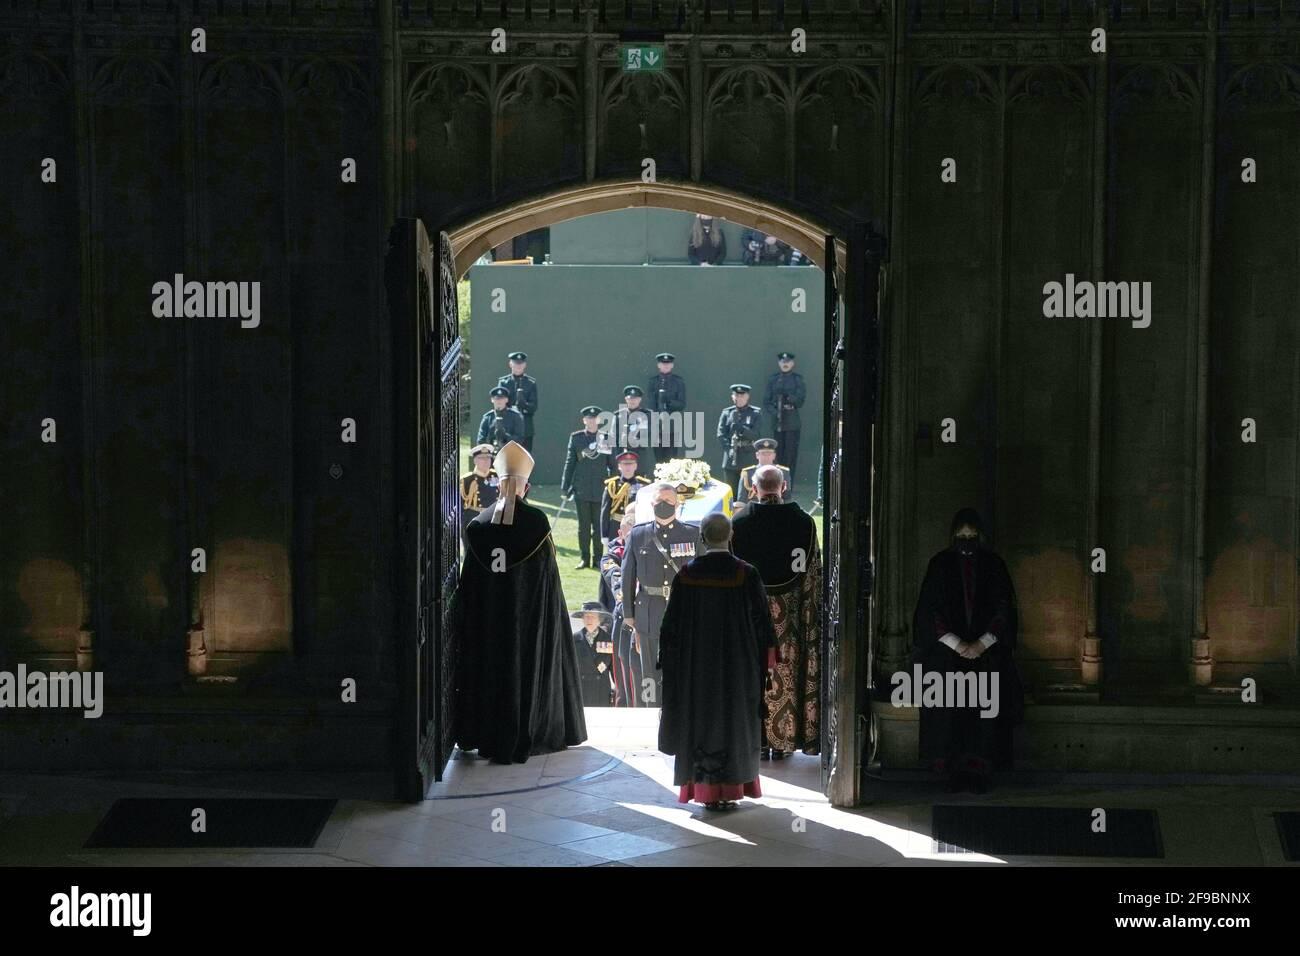 Los portadores de Pall llevan el ataúd del Duque de Edimburgo a la Capilla de San Jorge, el Castillo de Windsor, Berkshire. Fecha de la foto: Sábado 17 de abril de 2021. Foto de stock